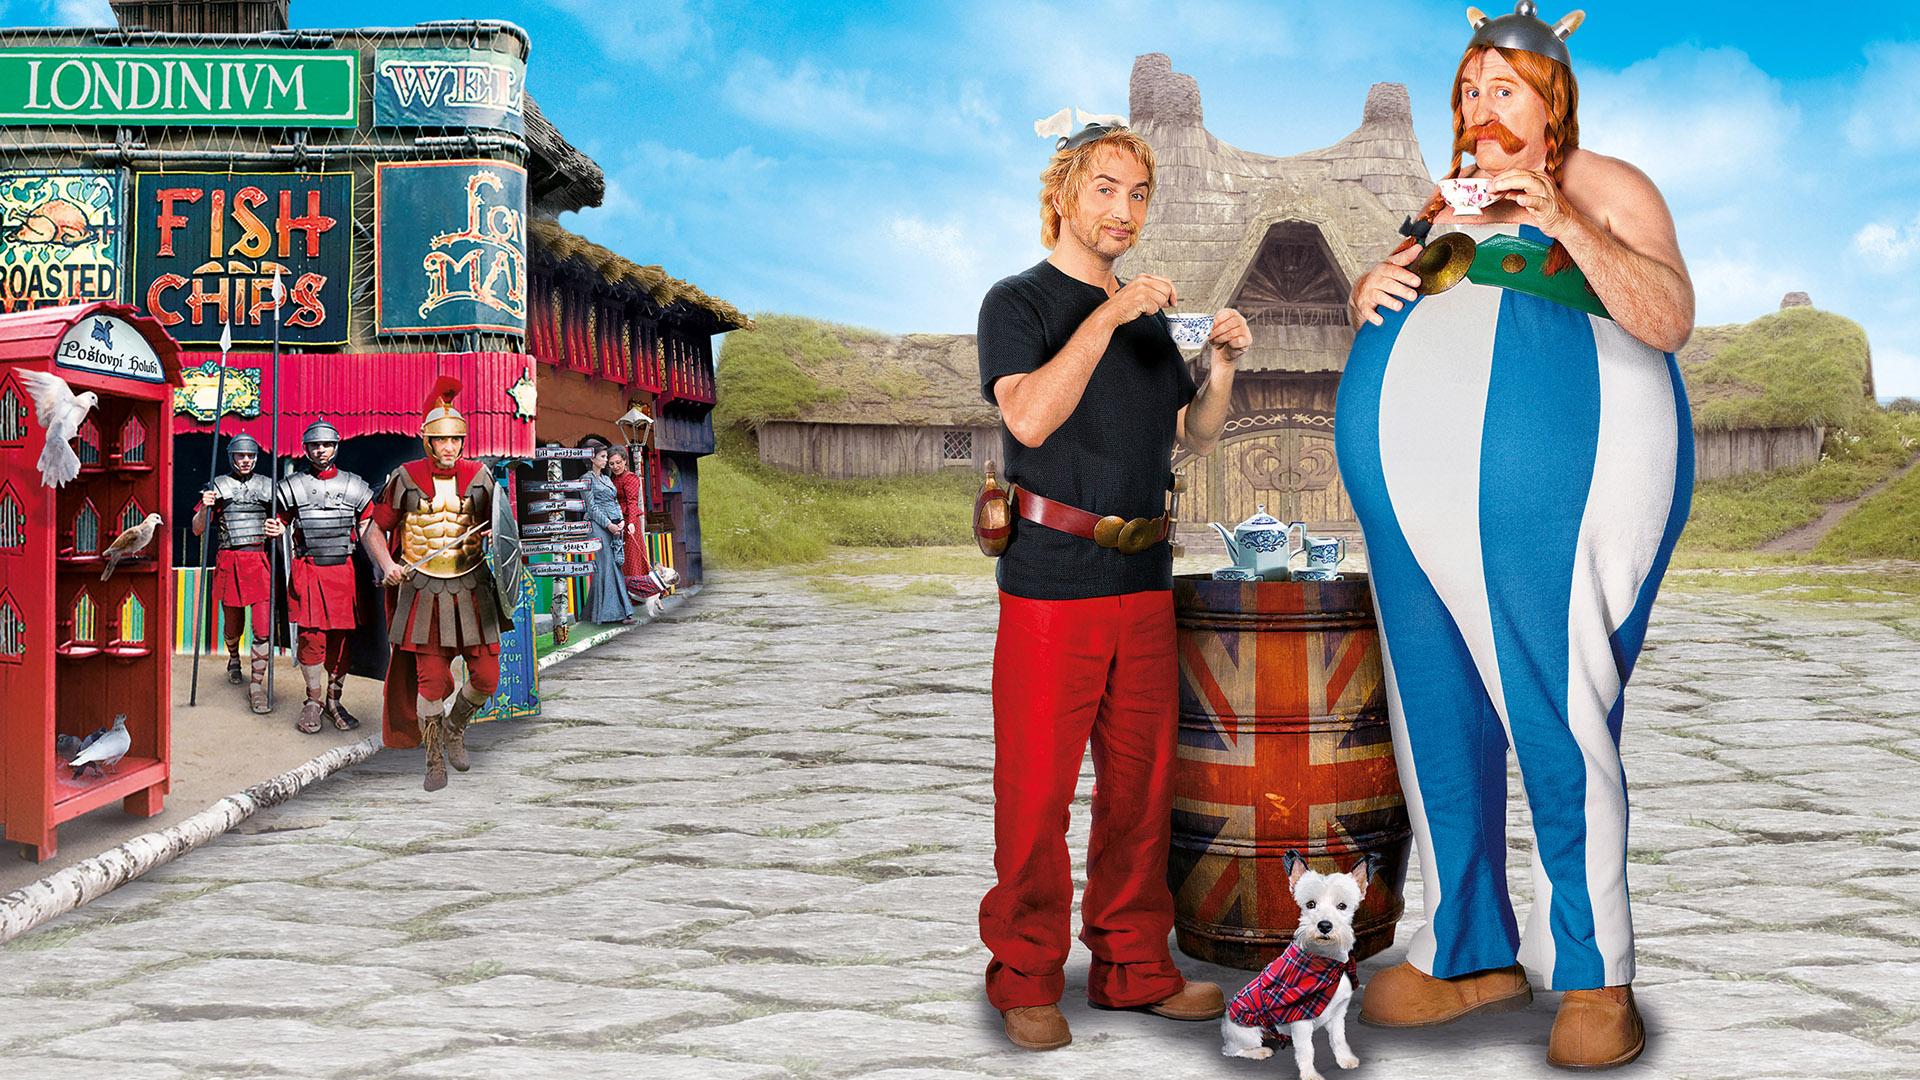 High Resolution Wallpaper | Asterix And Obelix: God Save Britannia 1920x1080 px